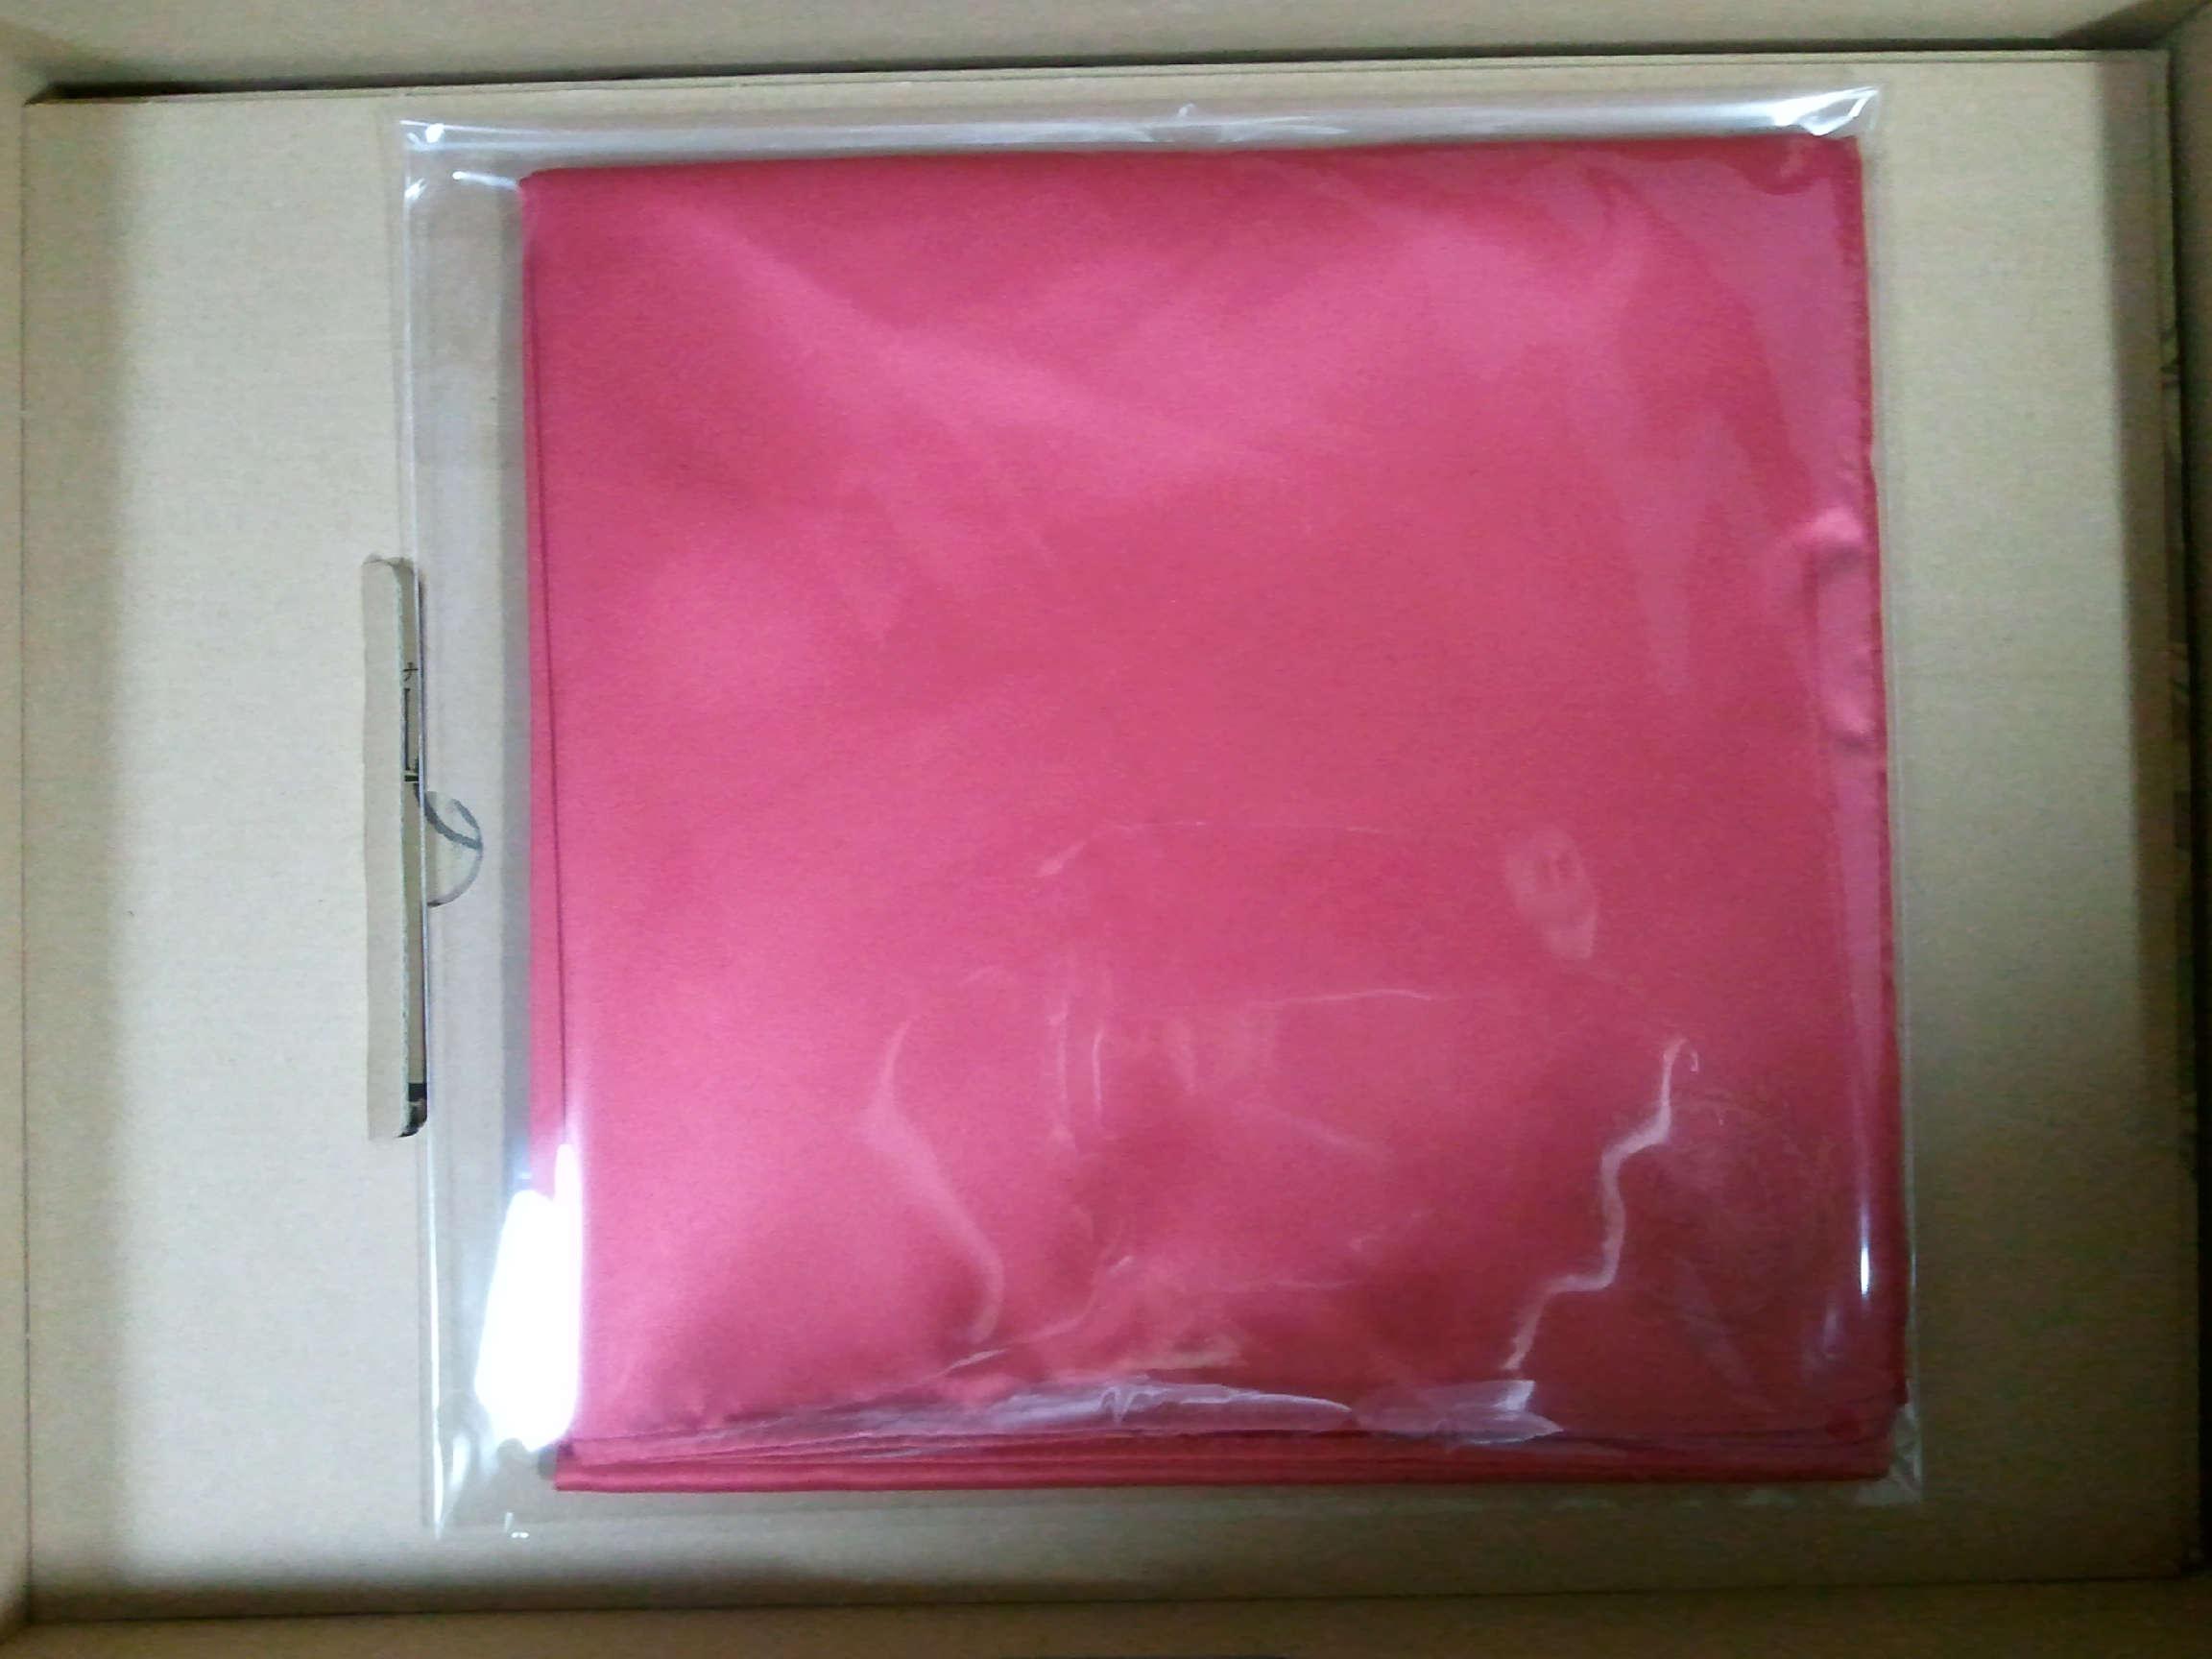 FINAL FANTASY 零式 HD Ultimate Boxスカーフ